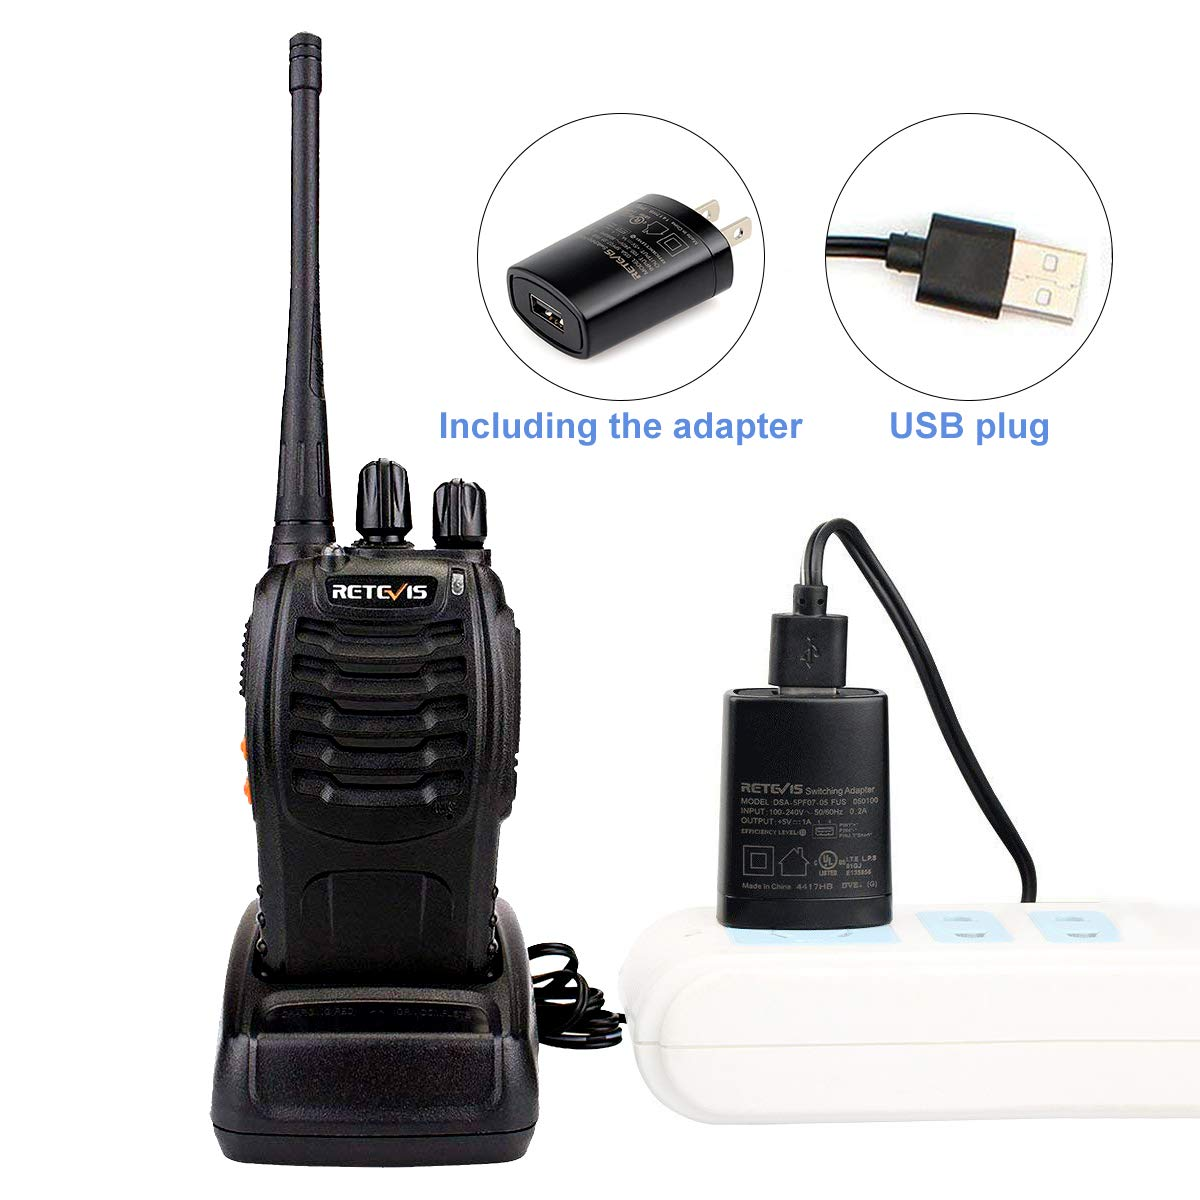 Retevis H-777 2 Way Radios UHF Long Range 16CH Emergency Portable Walkie Talkies Set 20 Pack with USB Charging Base